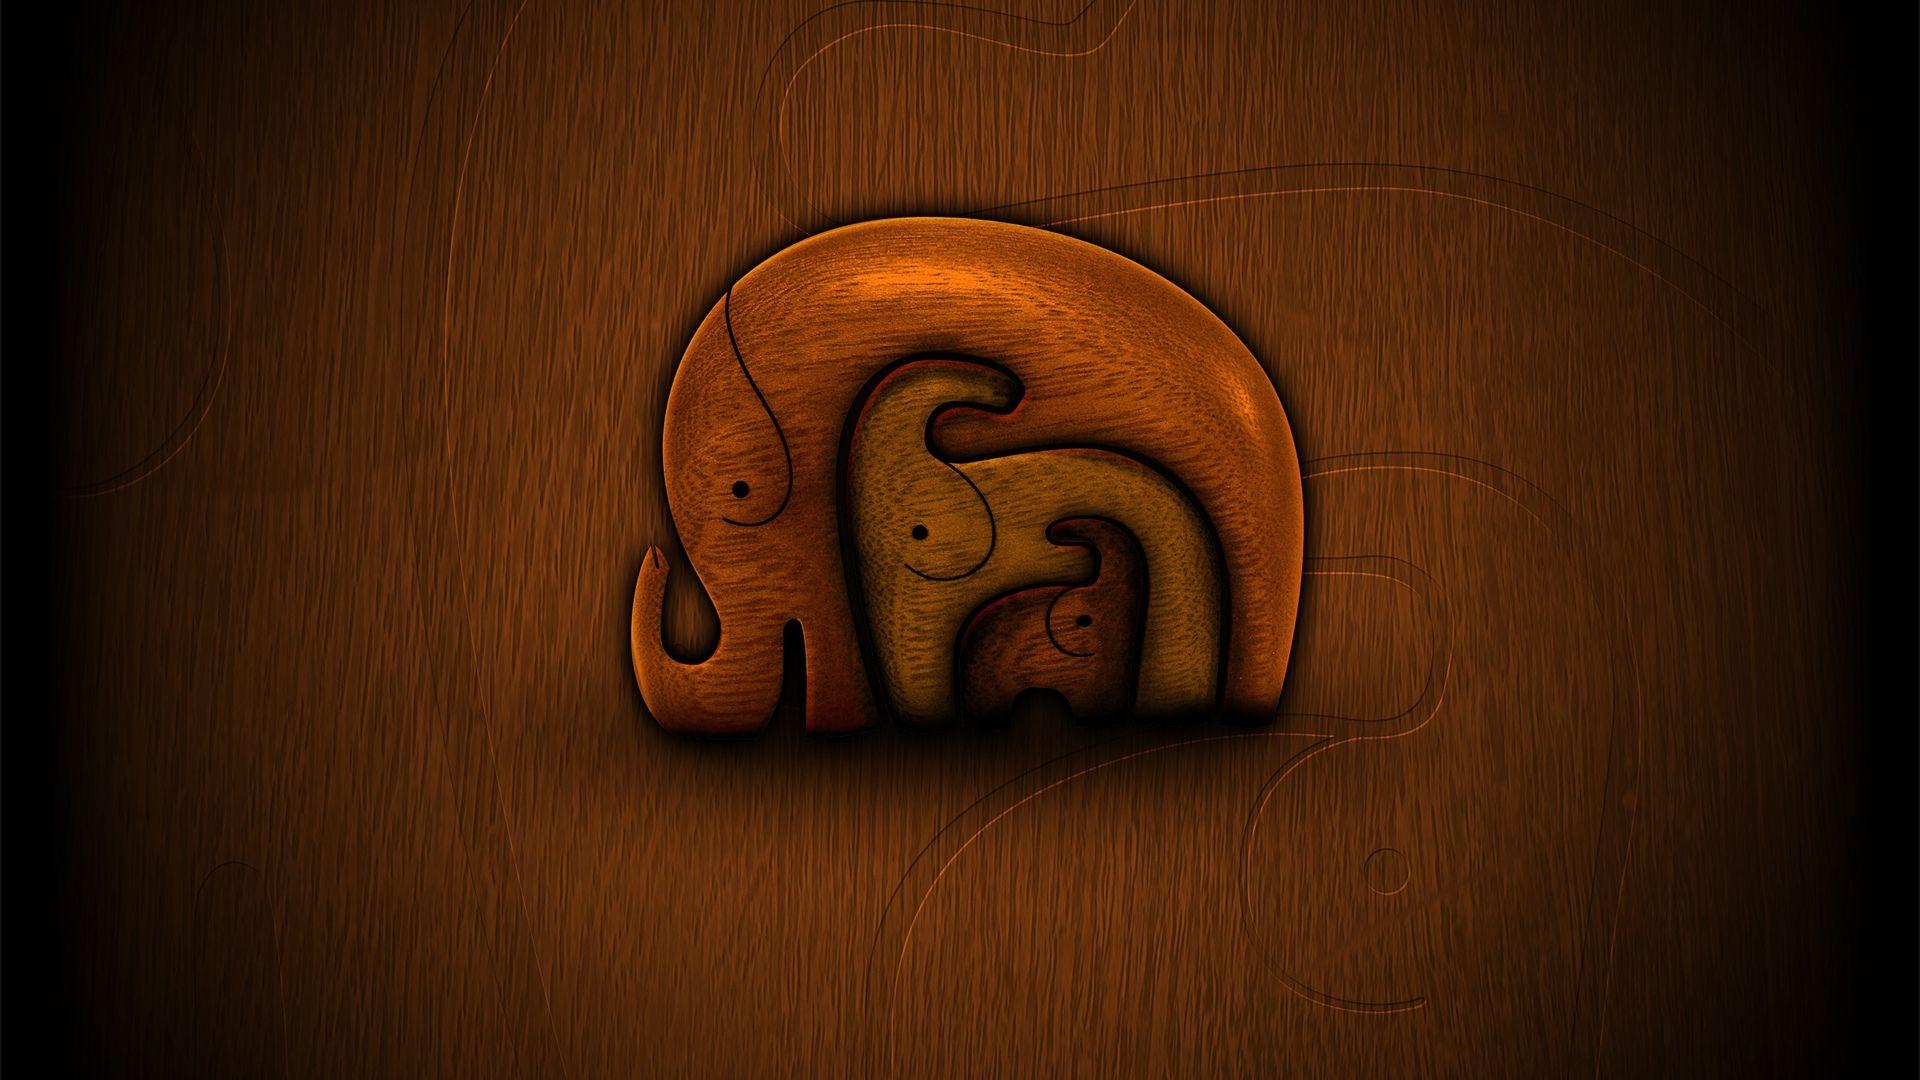 Hd wallpaper elephant - Best Ideas About Elephant Wallpaper On Pinterest Elephant